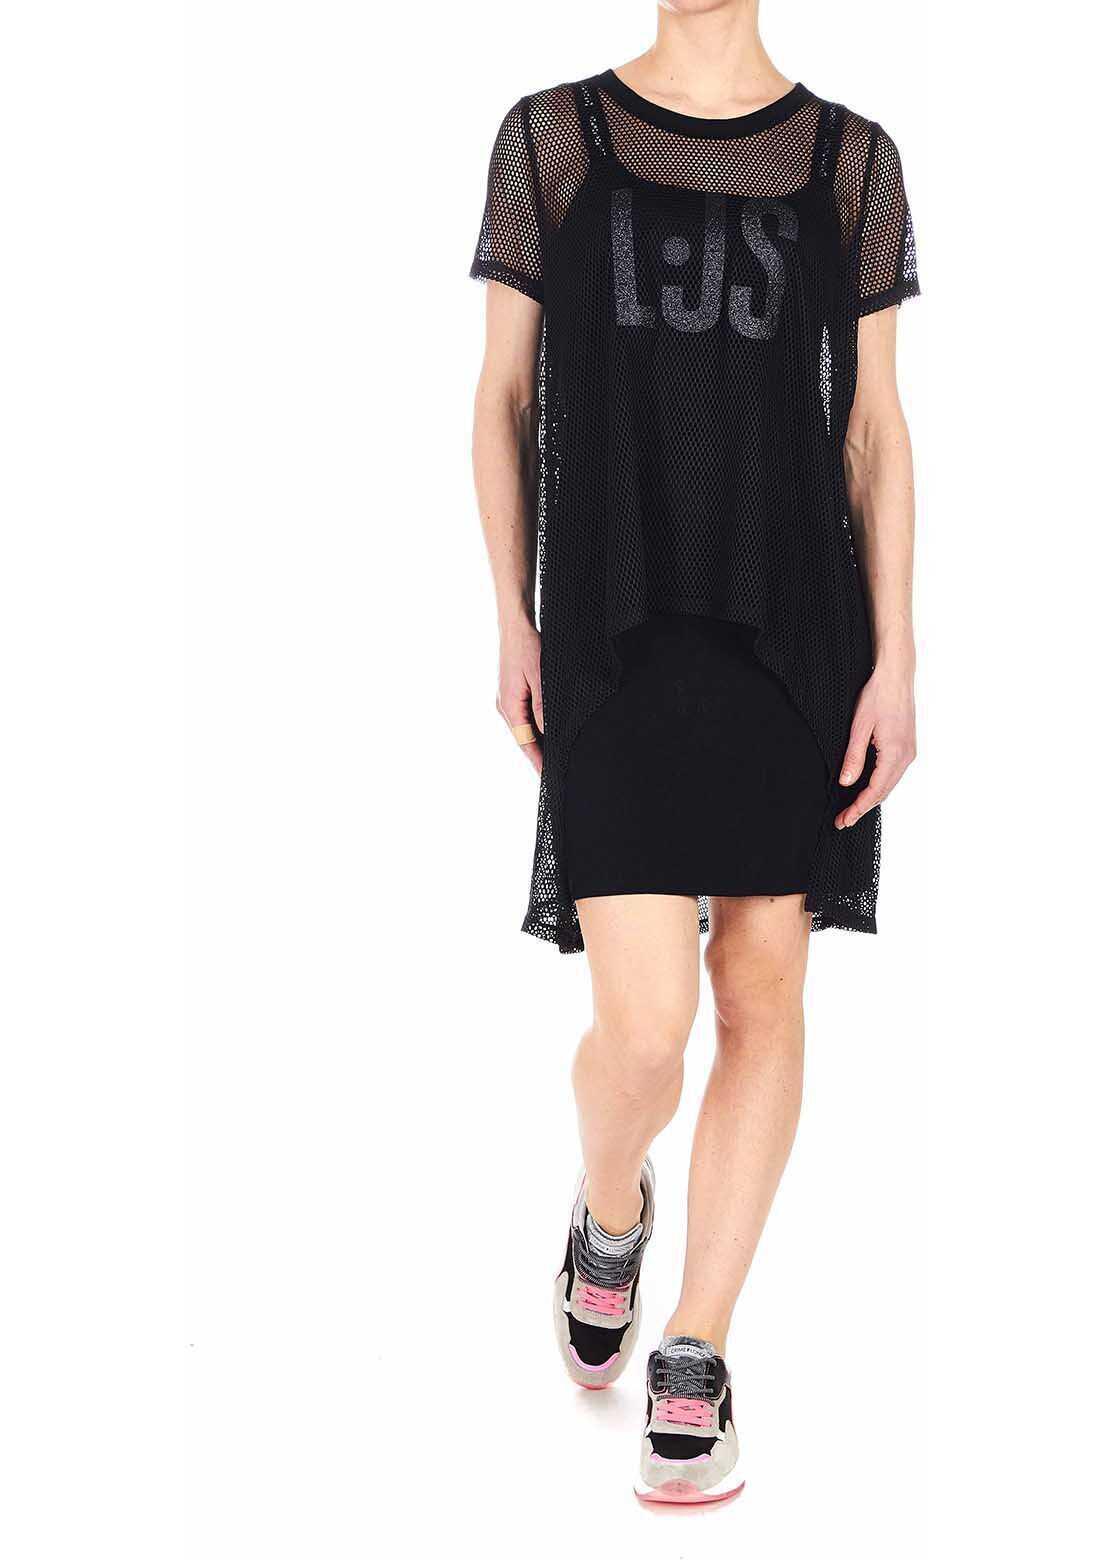 Liu Jo Mesh dress Black